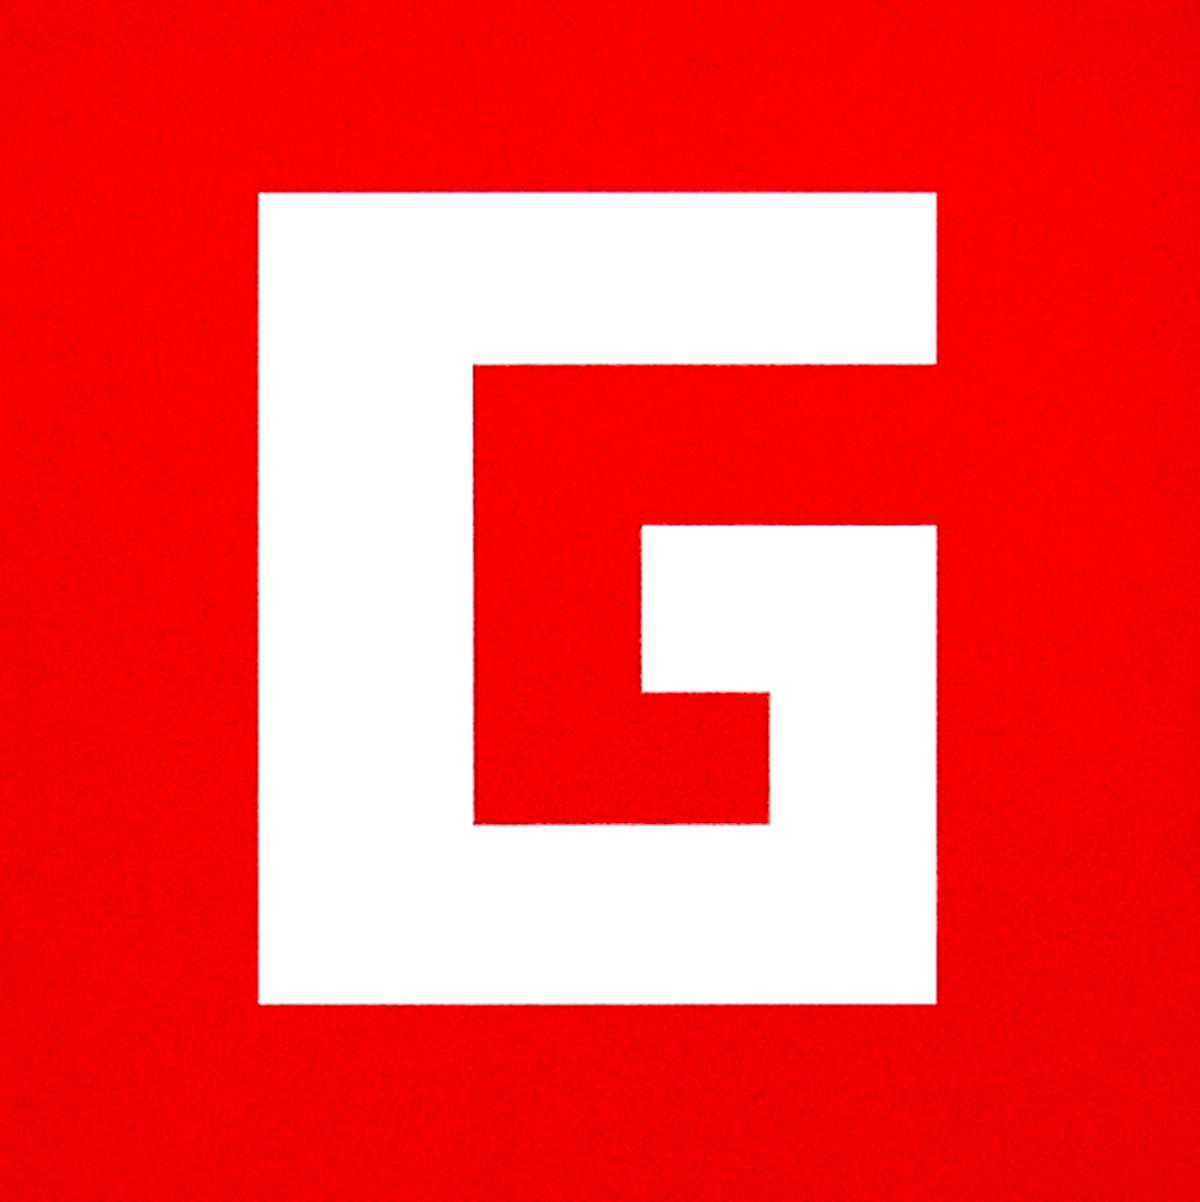 Signe singe - G